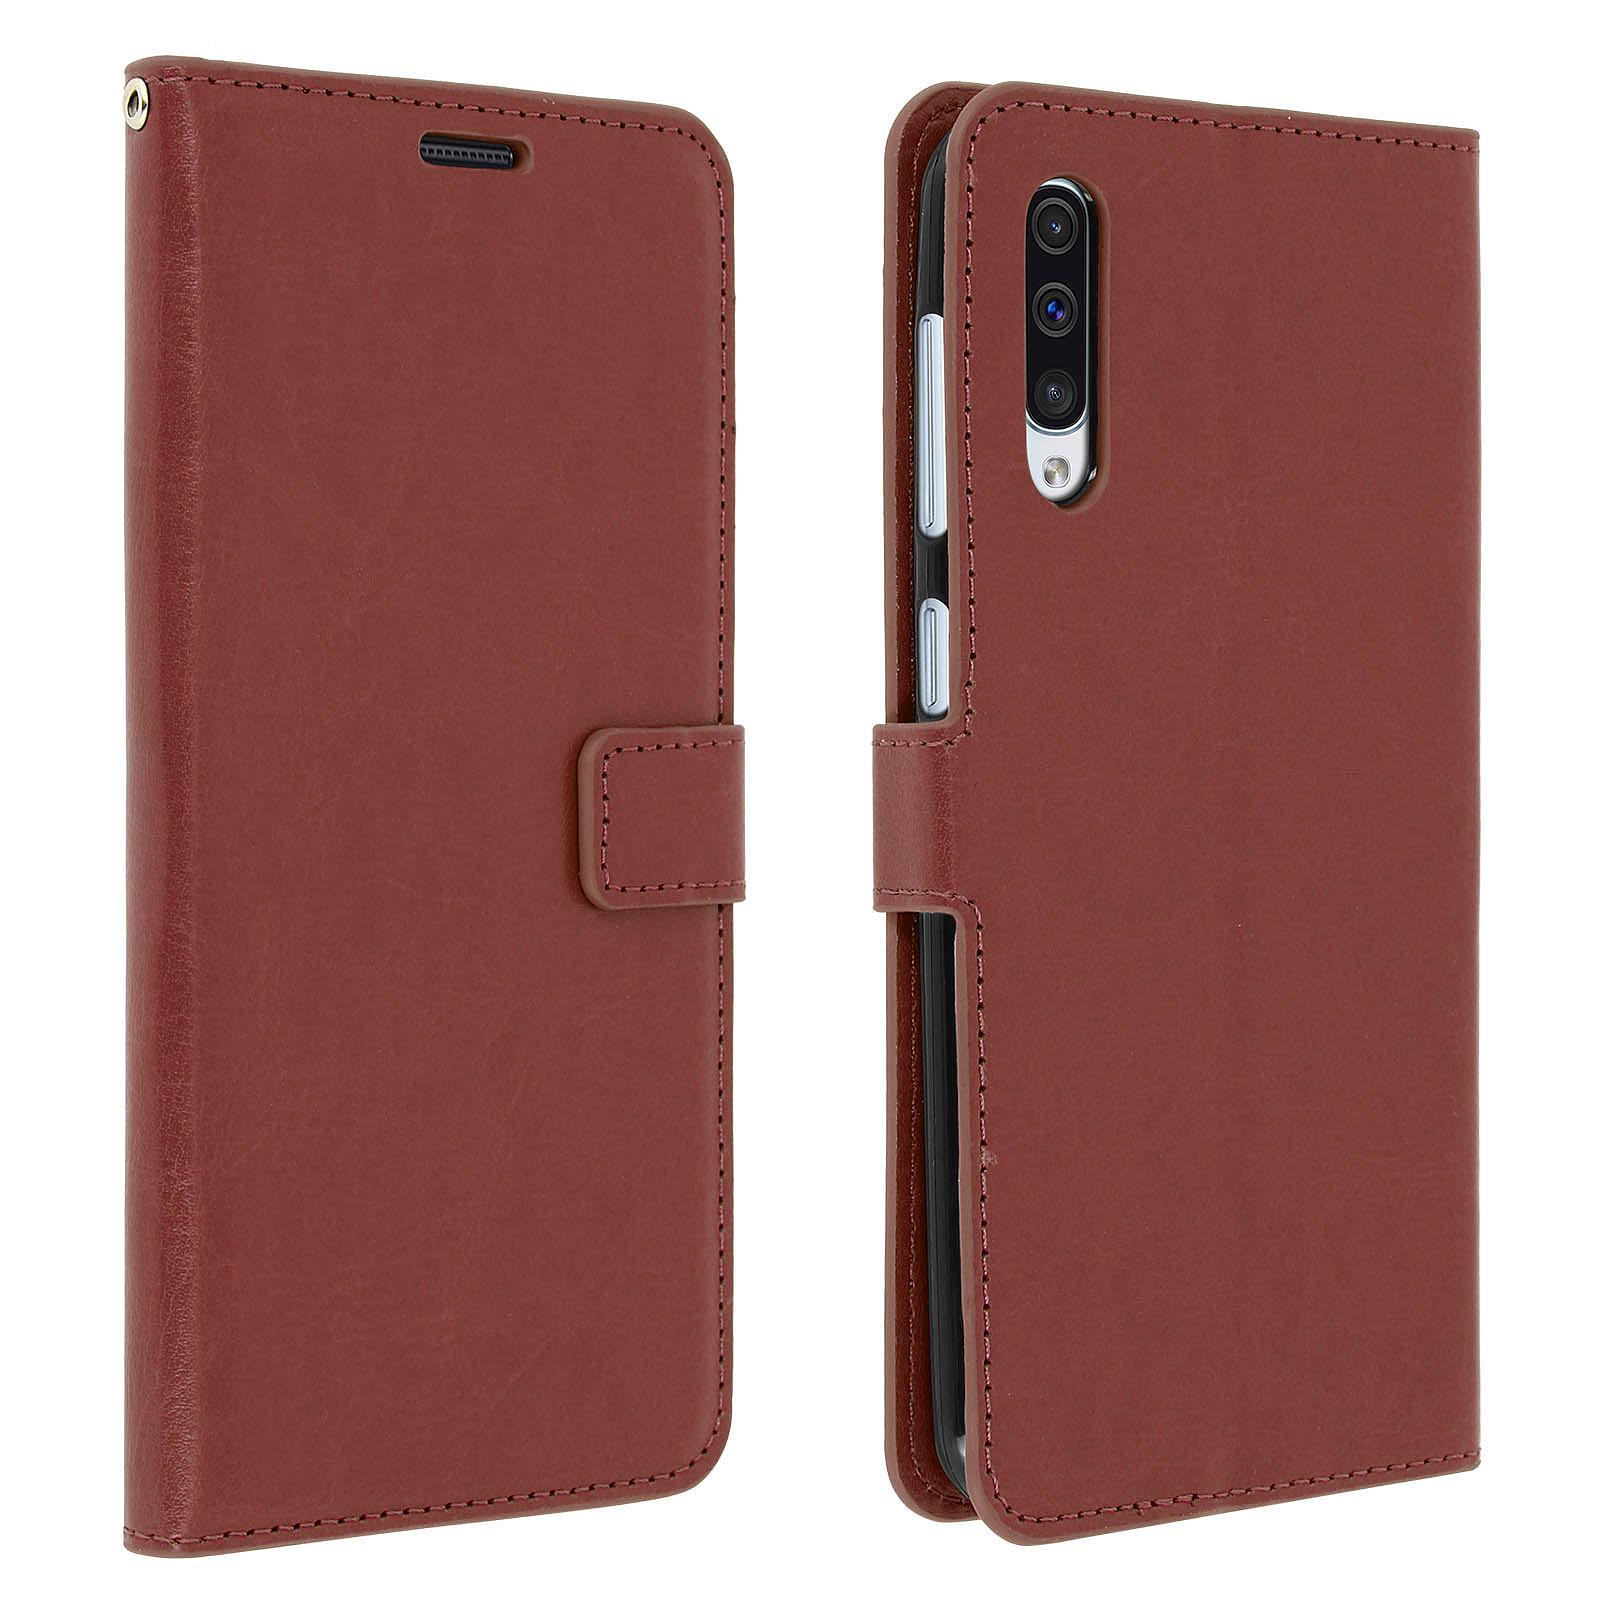 Avizar Etui folio Marron pour Samsung Galaxy A50 , Samsung Galaxy A30s